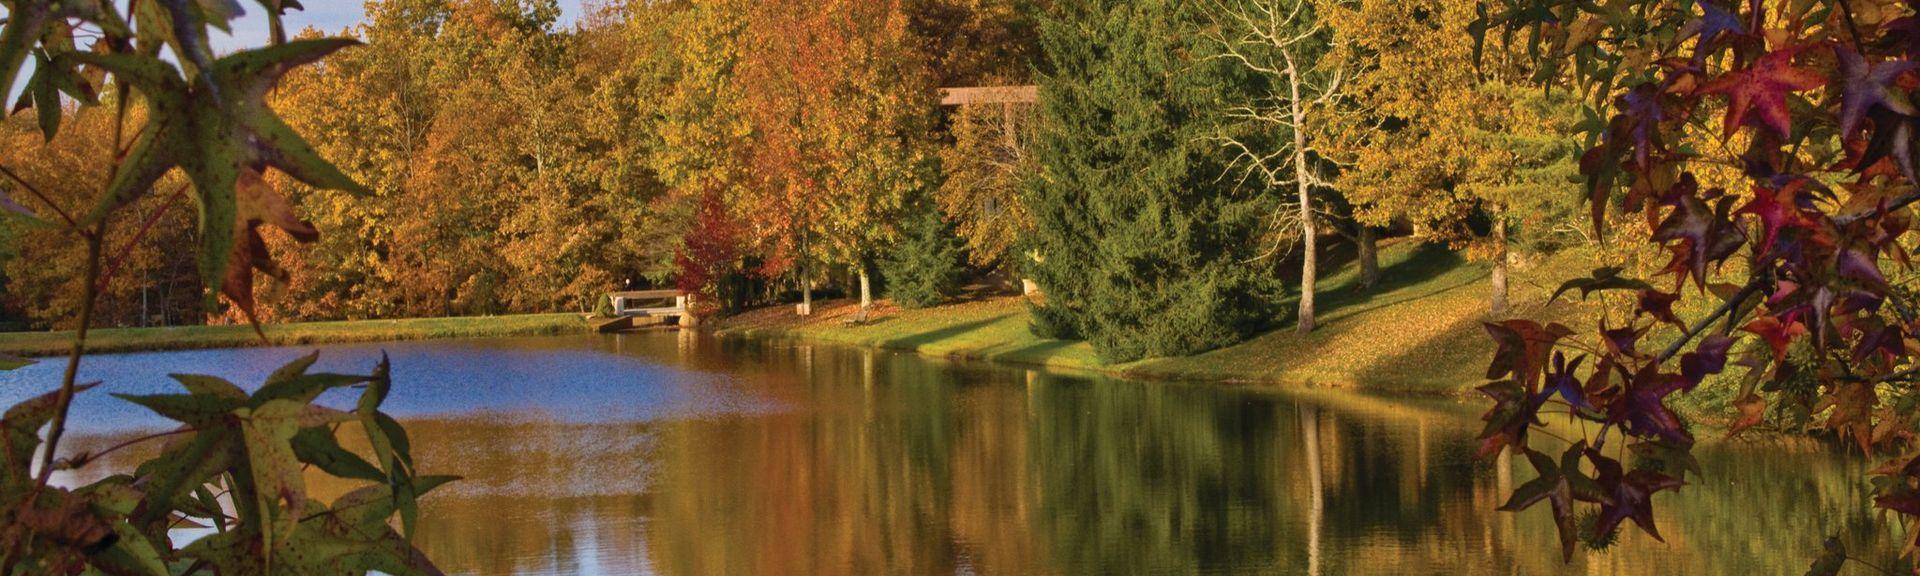 Fairfield Glade, Crossville, Tennessee, USA